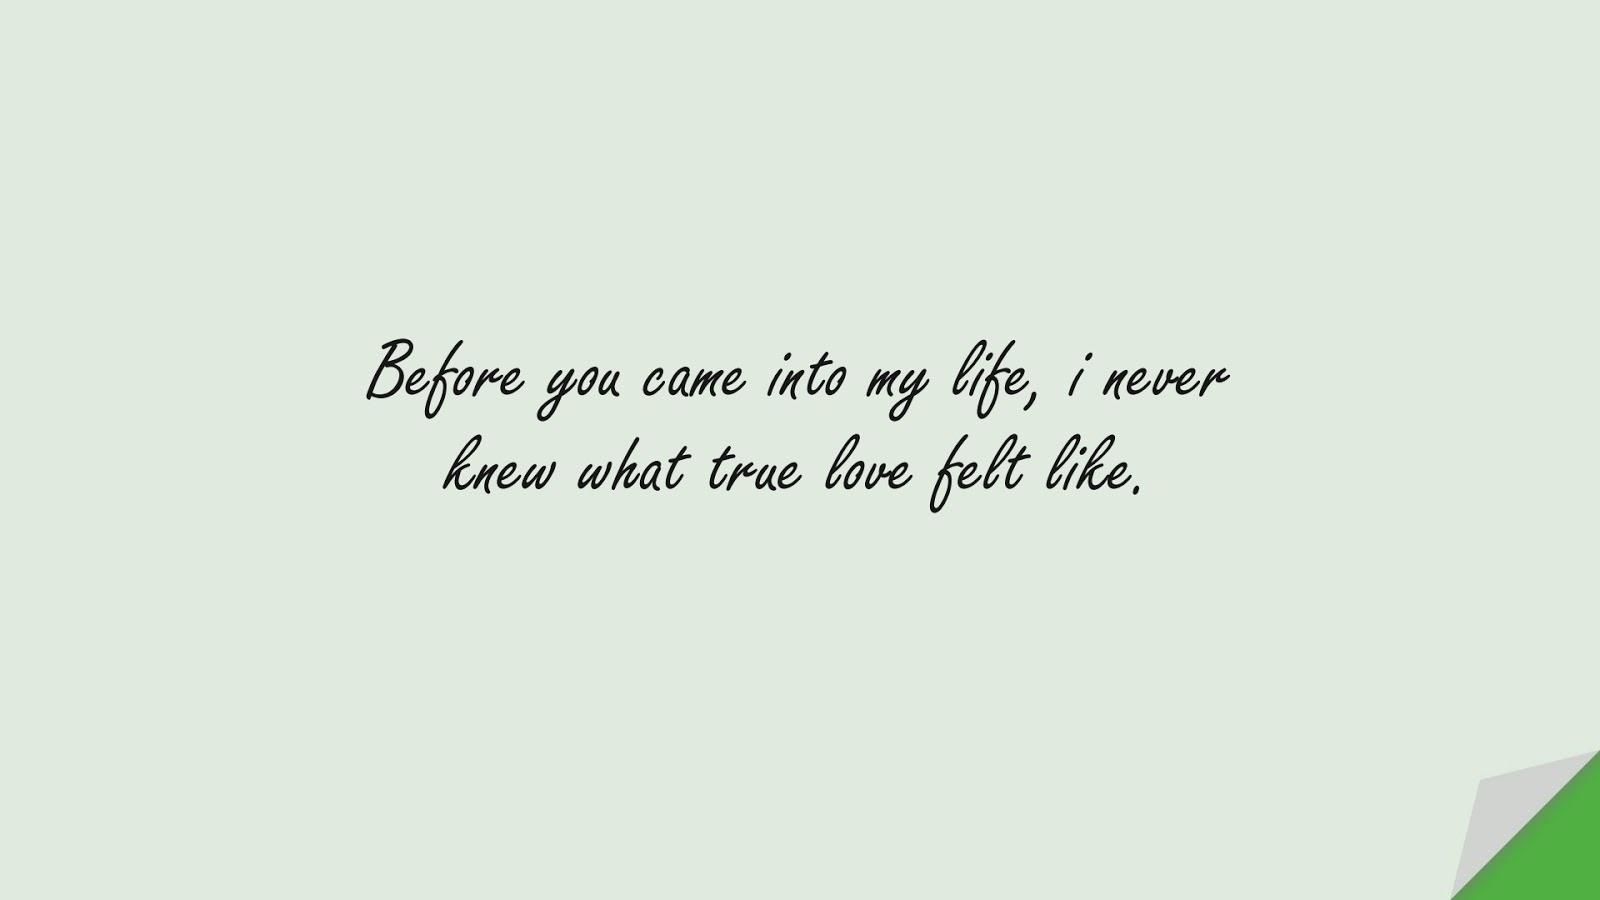 Before you came into my life, i never knew what true love felt like.FALSE